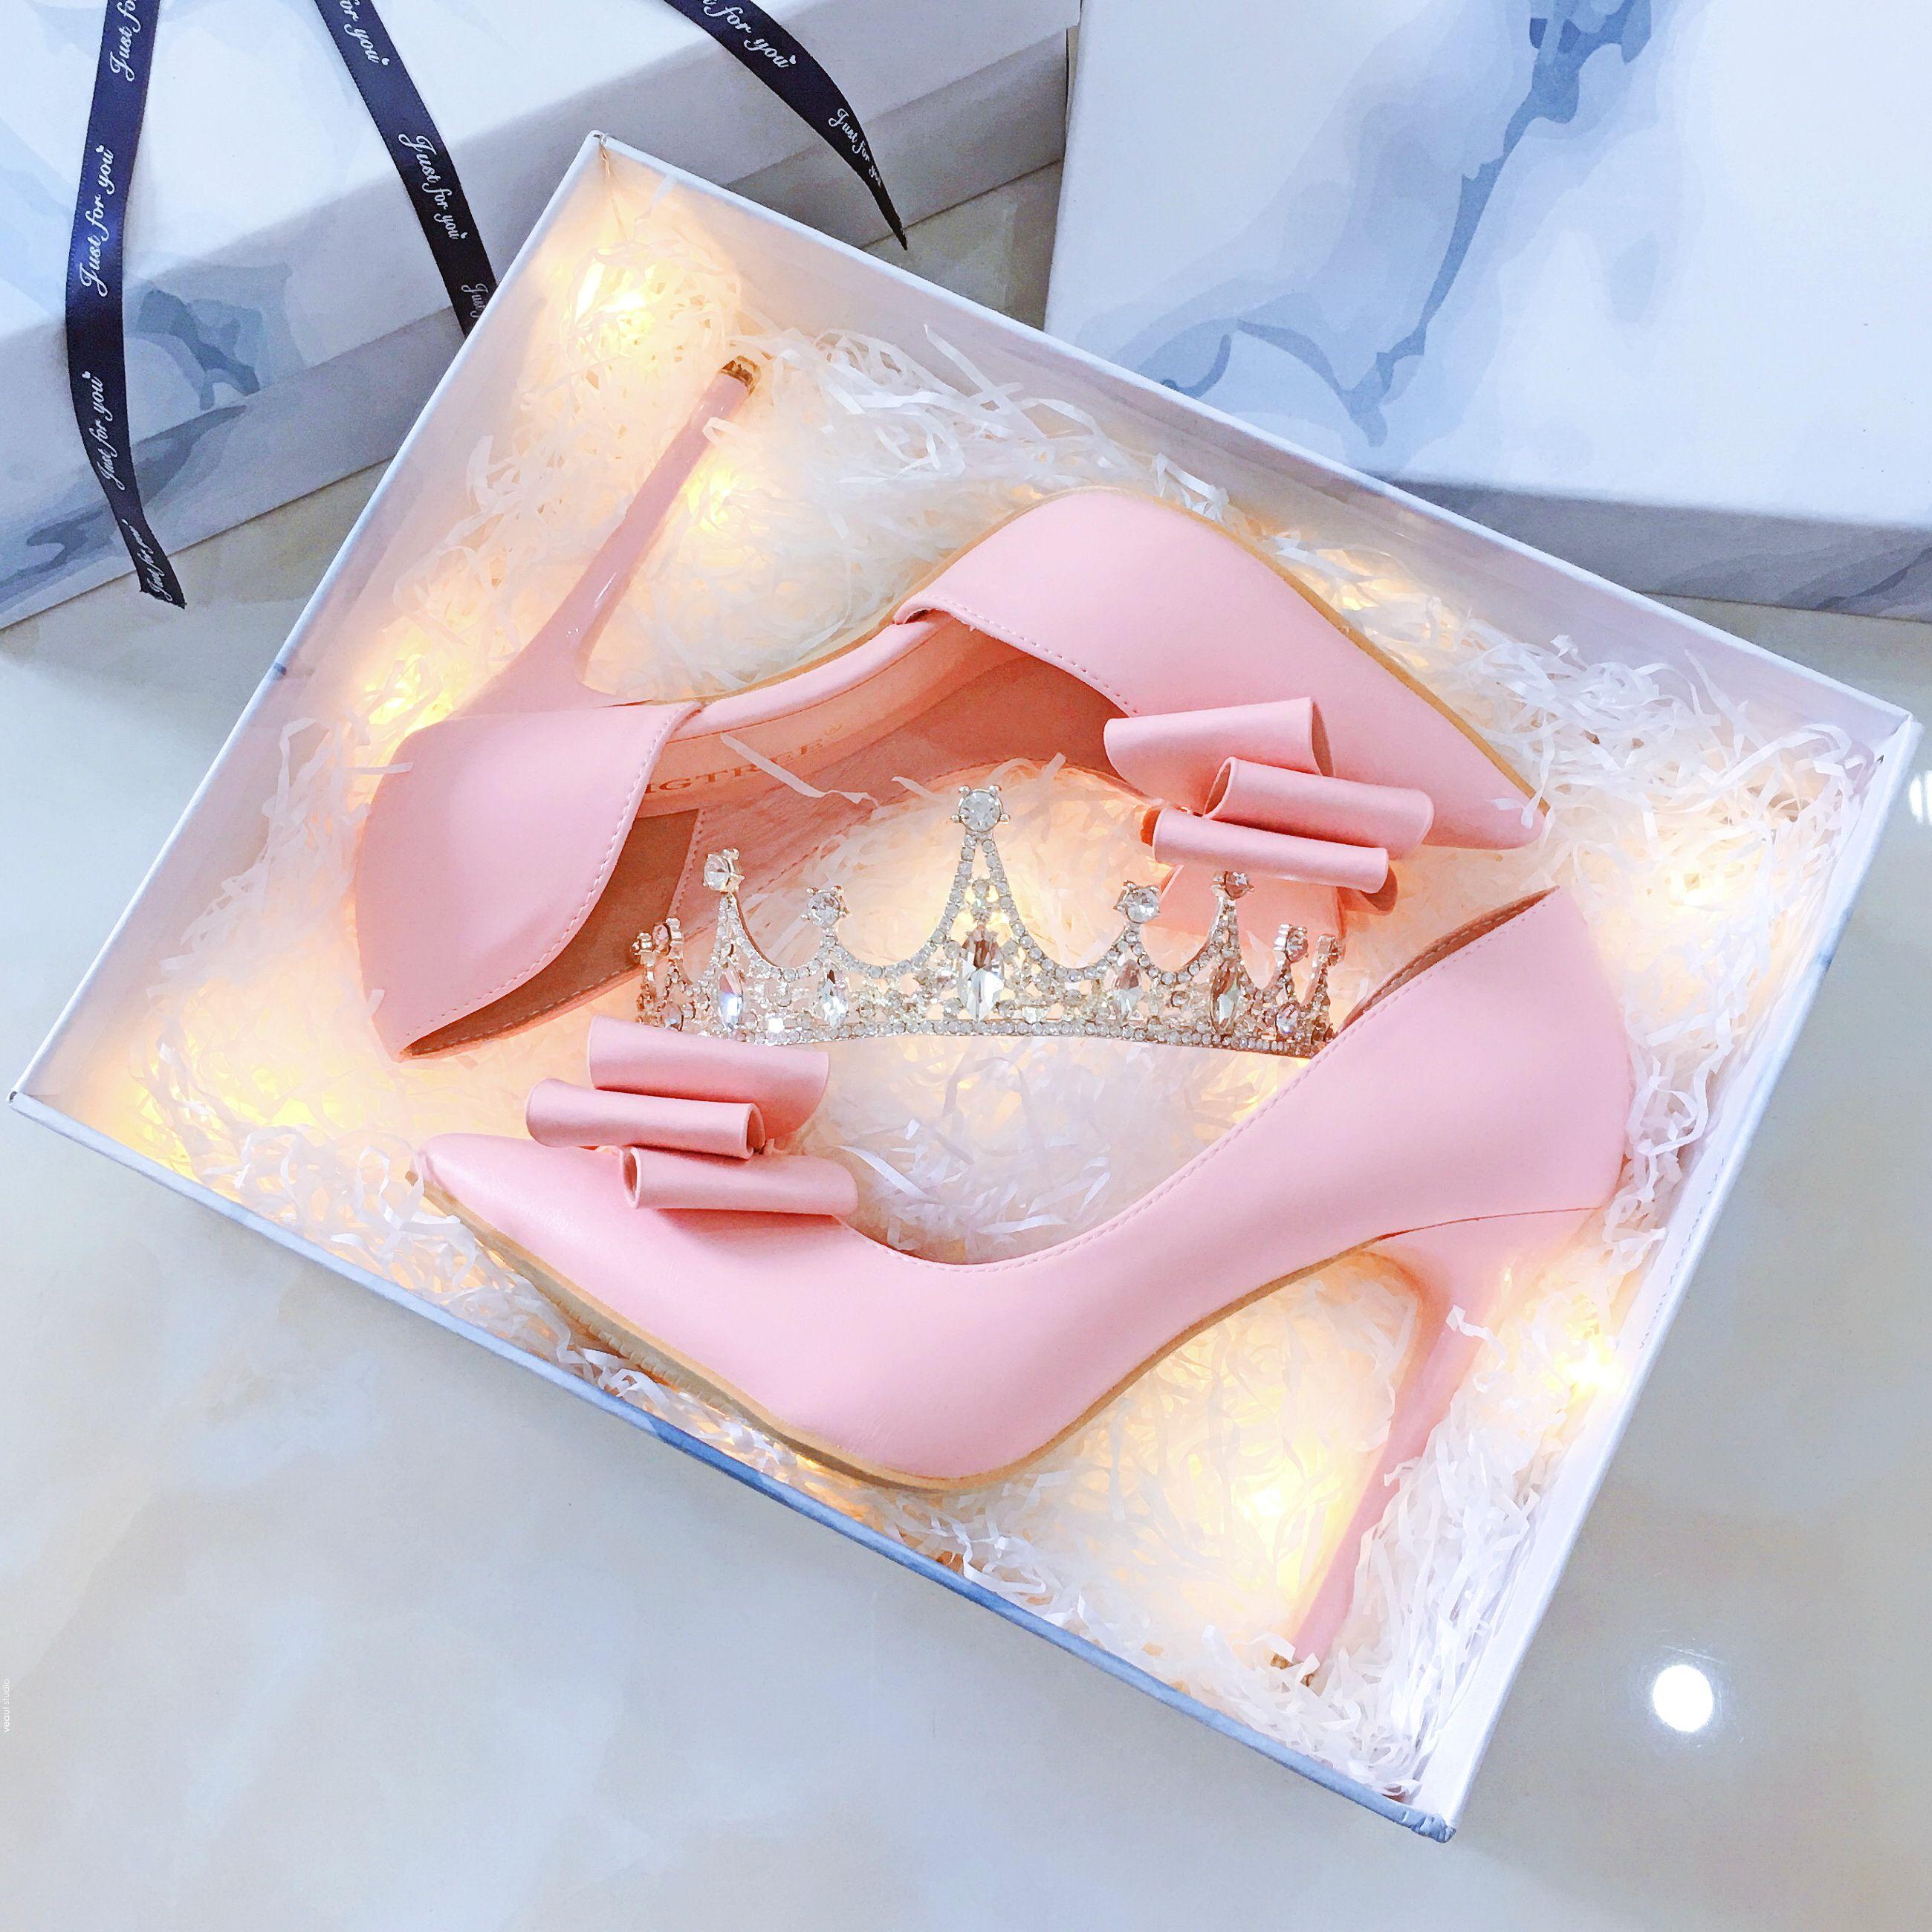 Modern / Fashion Candy Pink Wedding Shoes 2019 Bow 10 cm Stiletto Heels Pointed Toe Wedding Pumps